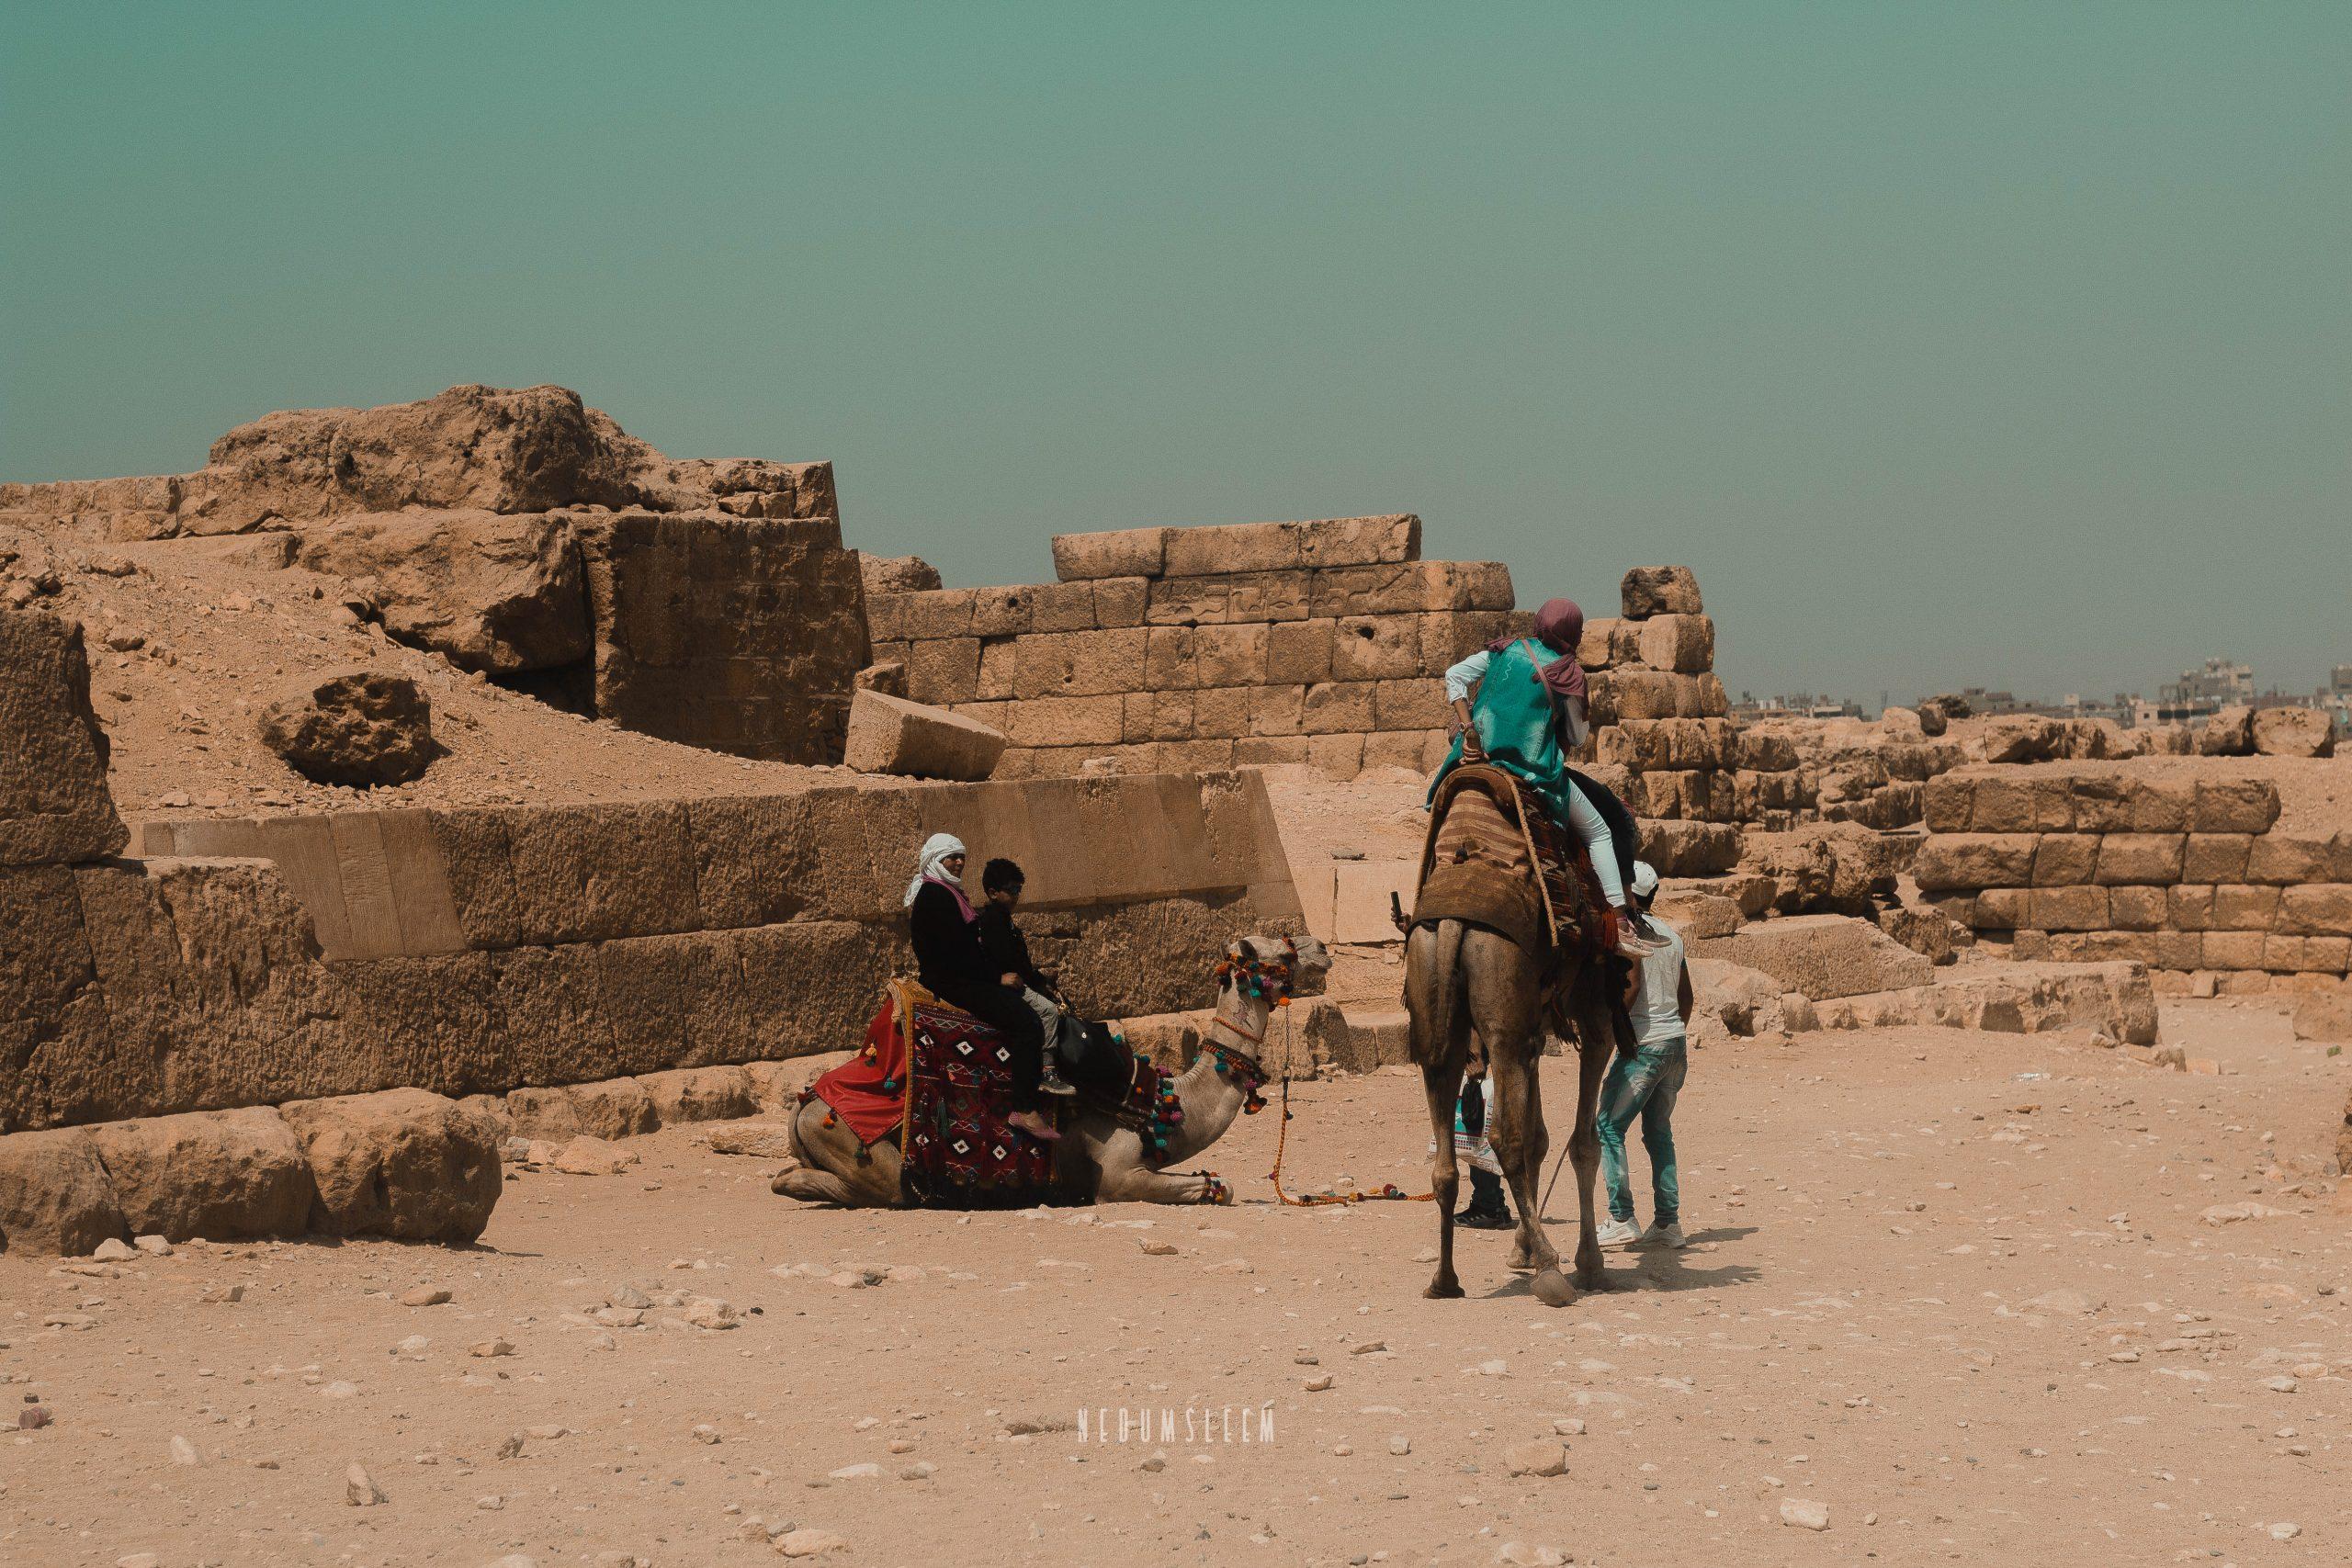 Desert Company,Photo: Desert Travellers, Camels, Stones-Chinedum Odunze